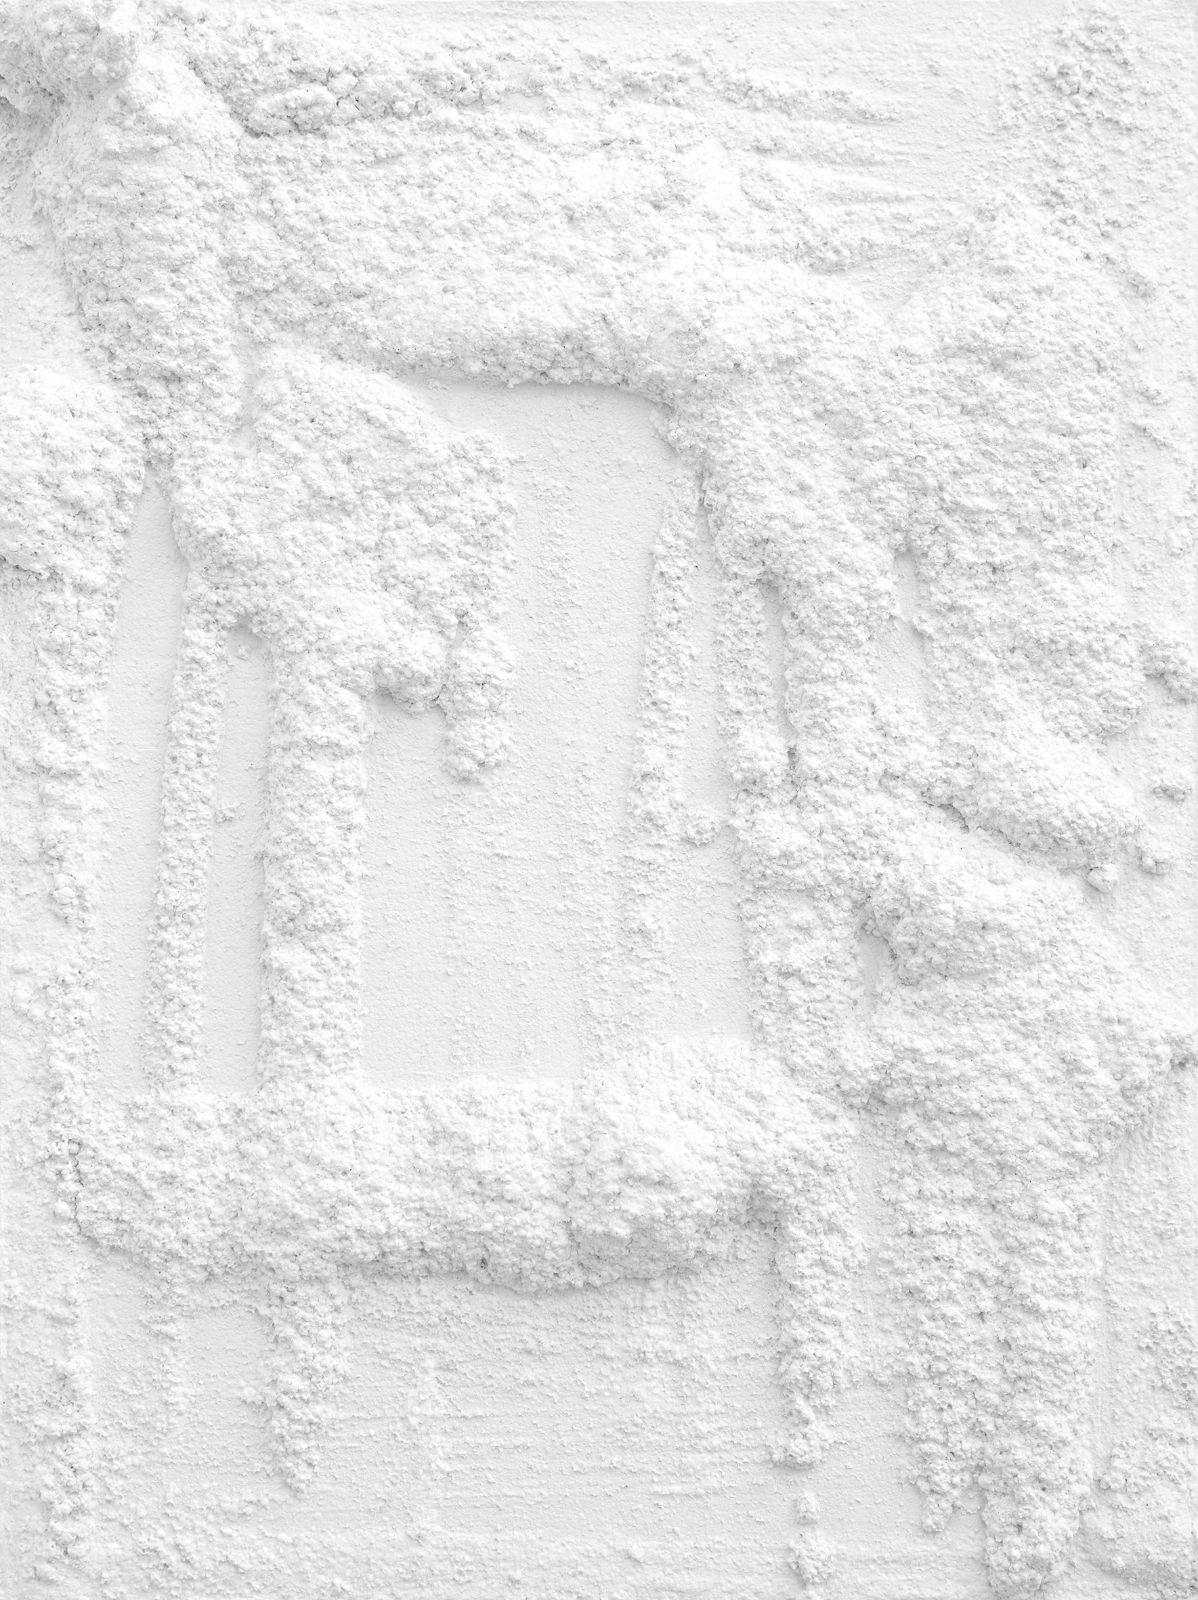 Untitled, 2012, plaster, 60 x 45 x 8,5 cm